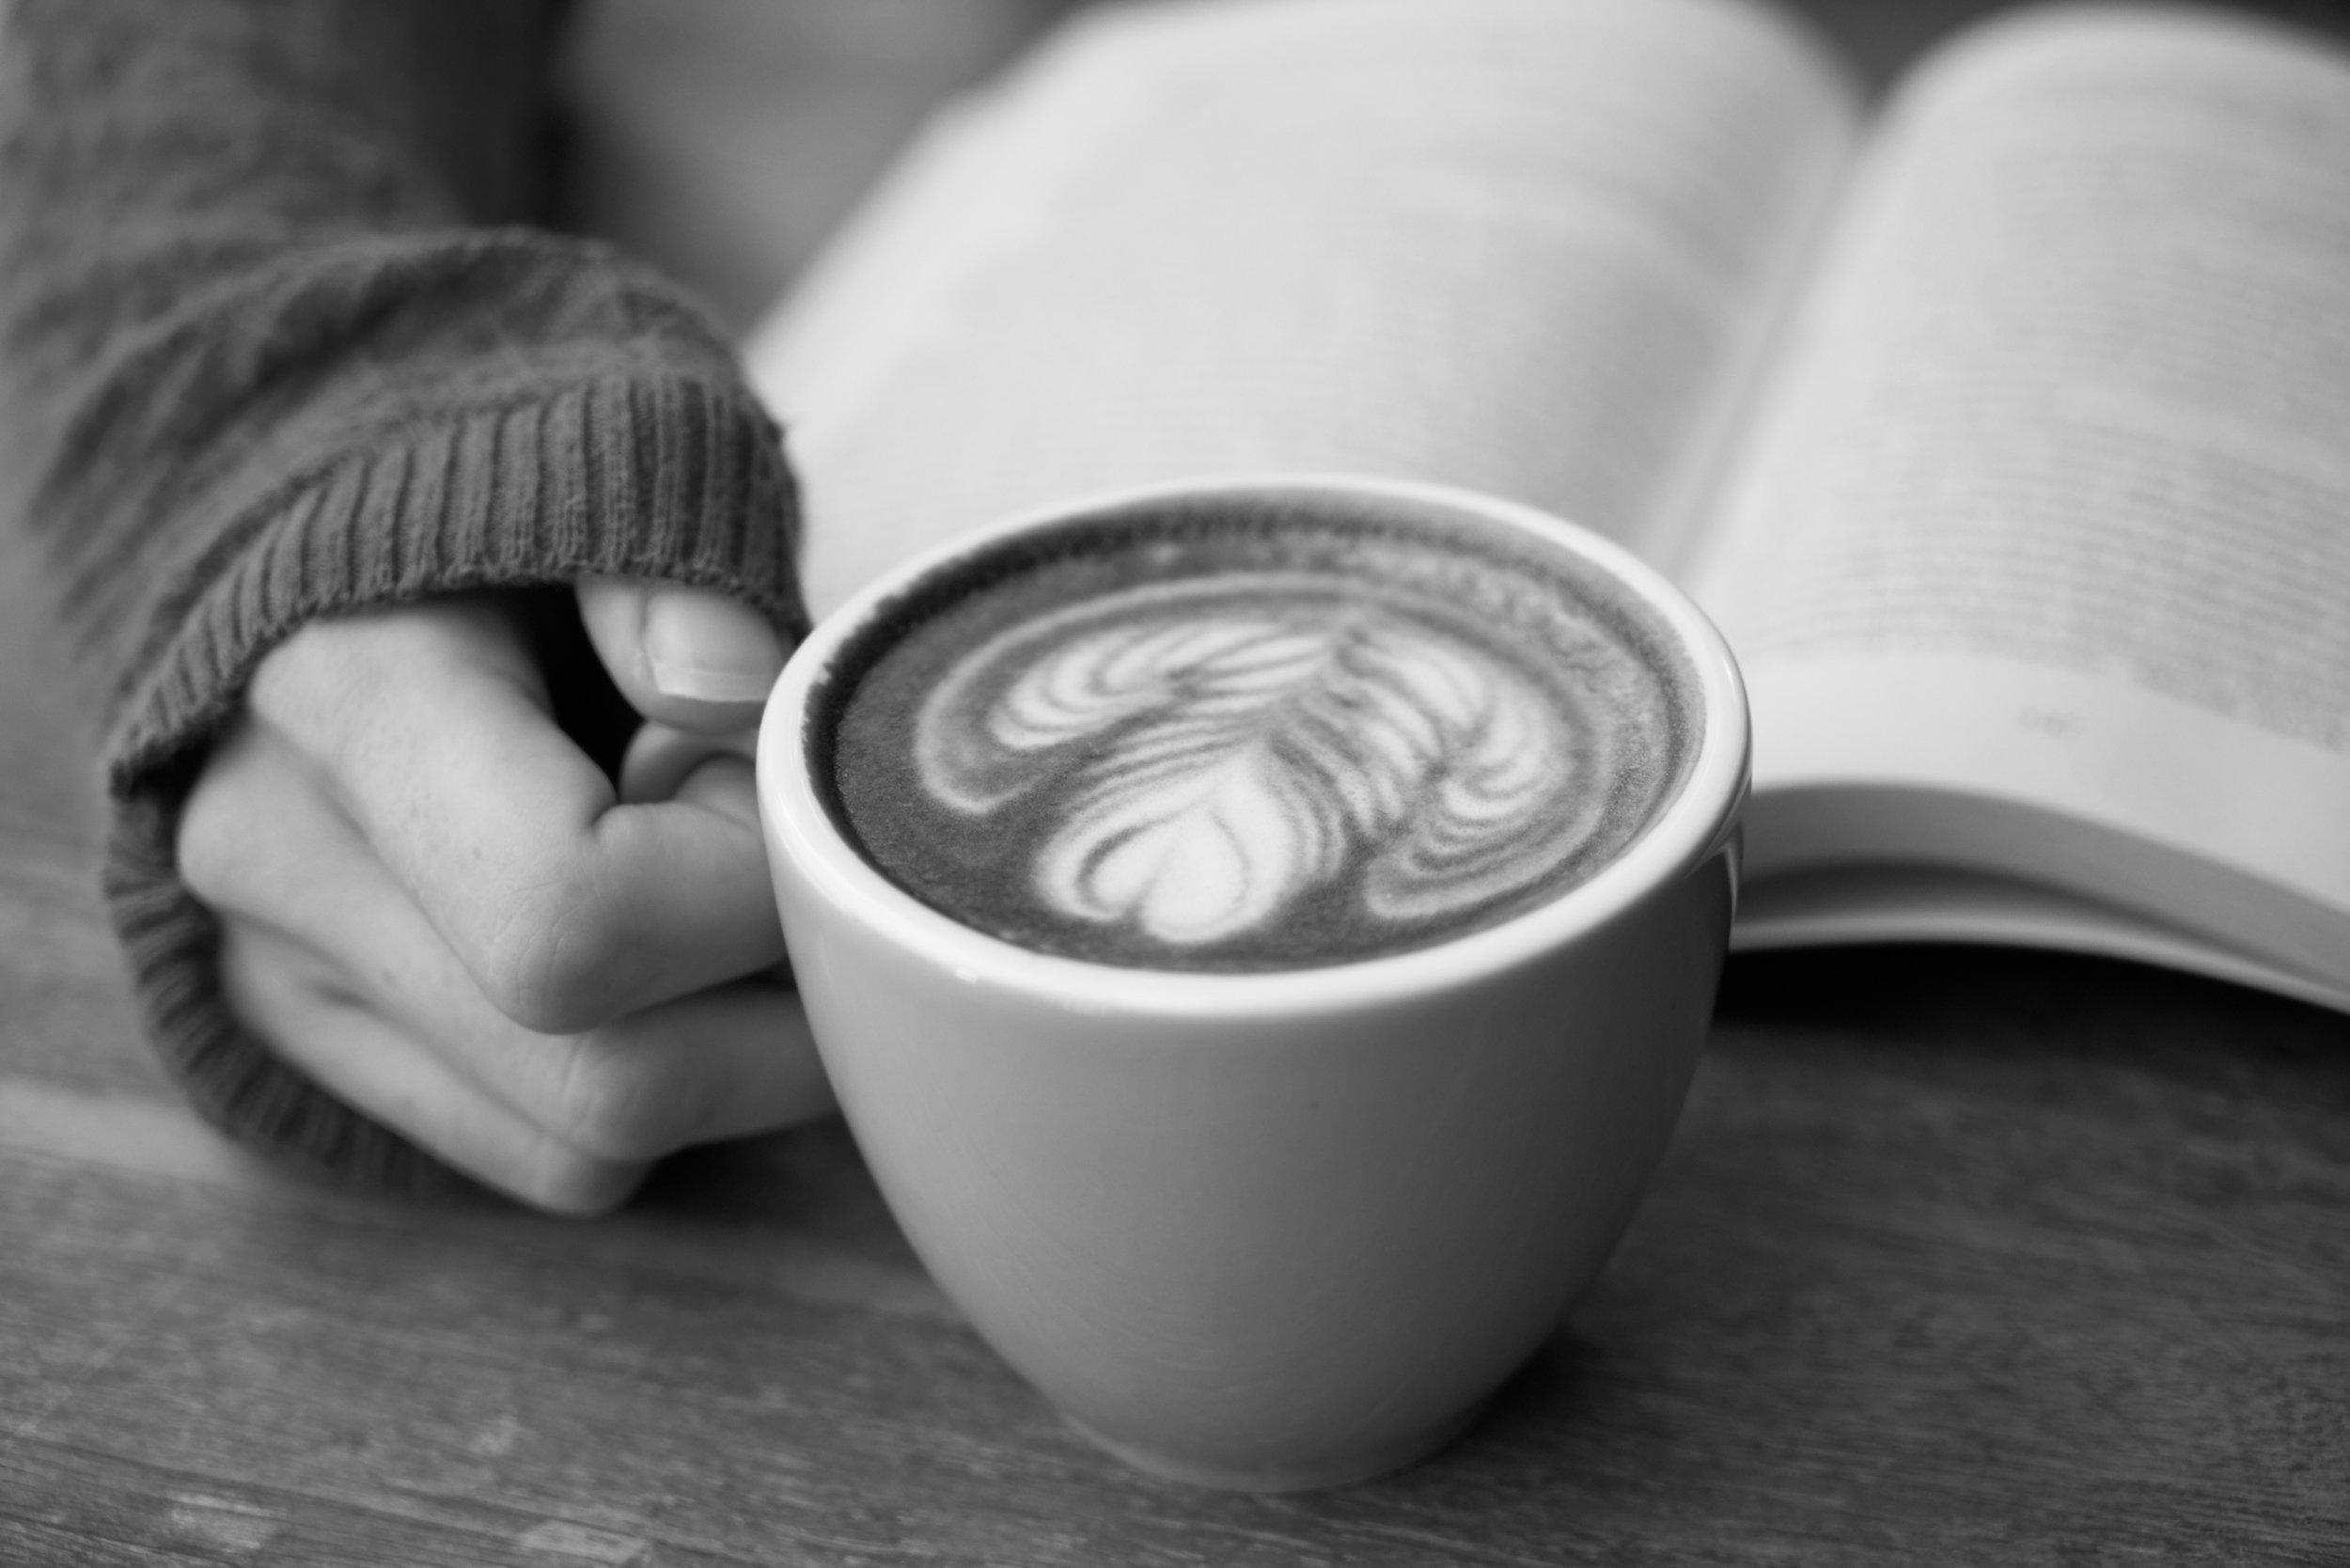 coffee-book-latte-news.jpeg